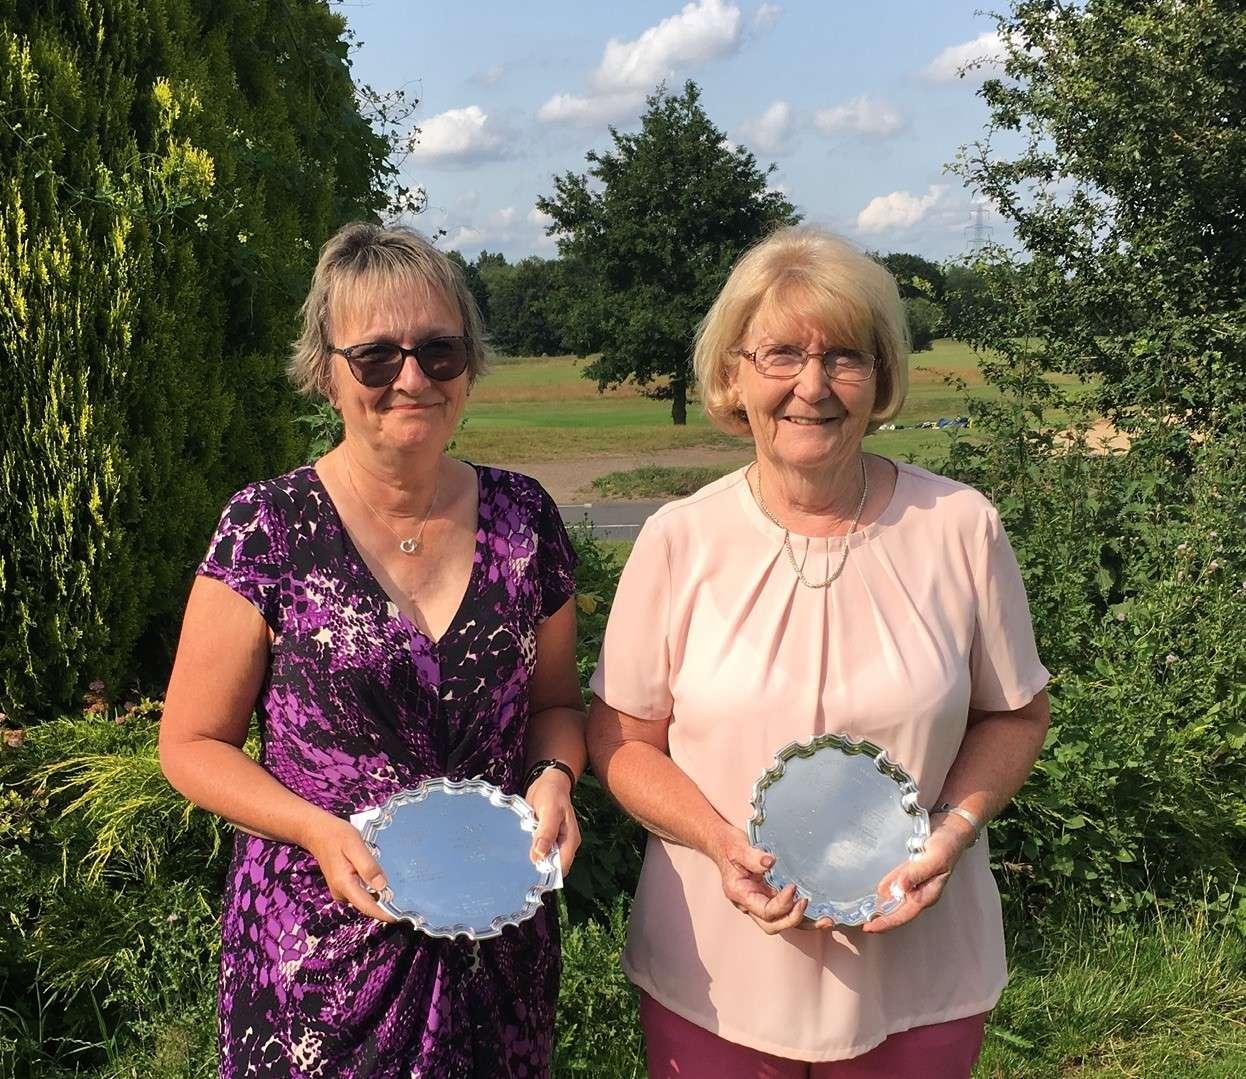 Centenary Foursomes 2019 Linda Gilham & Pam Willshere